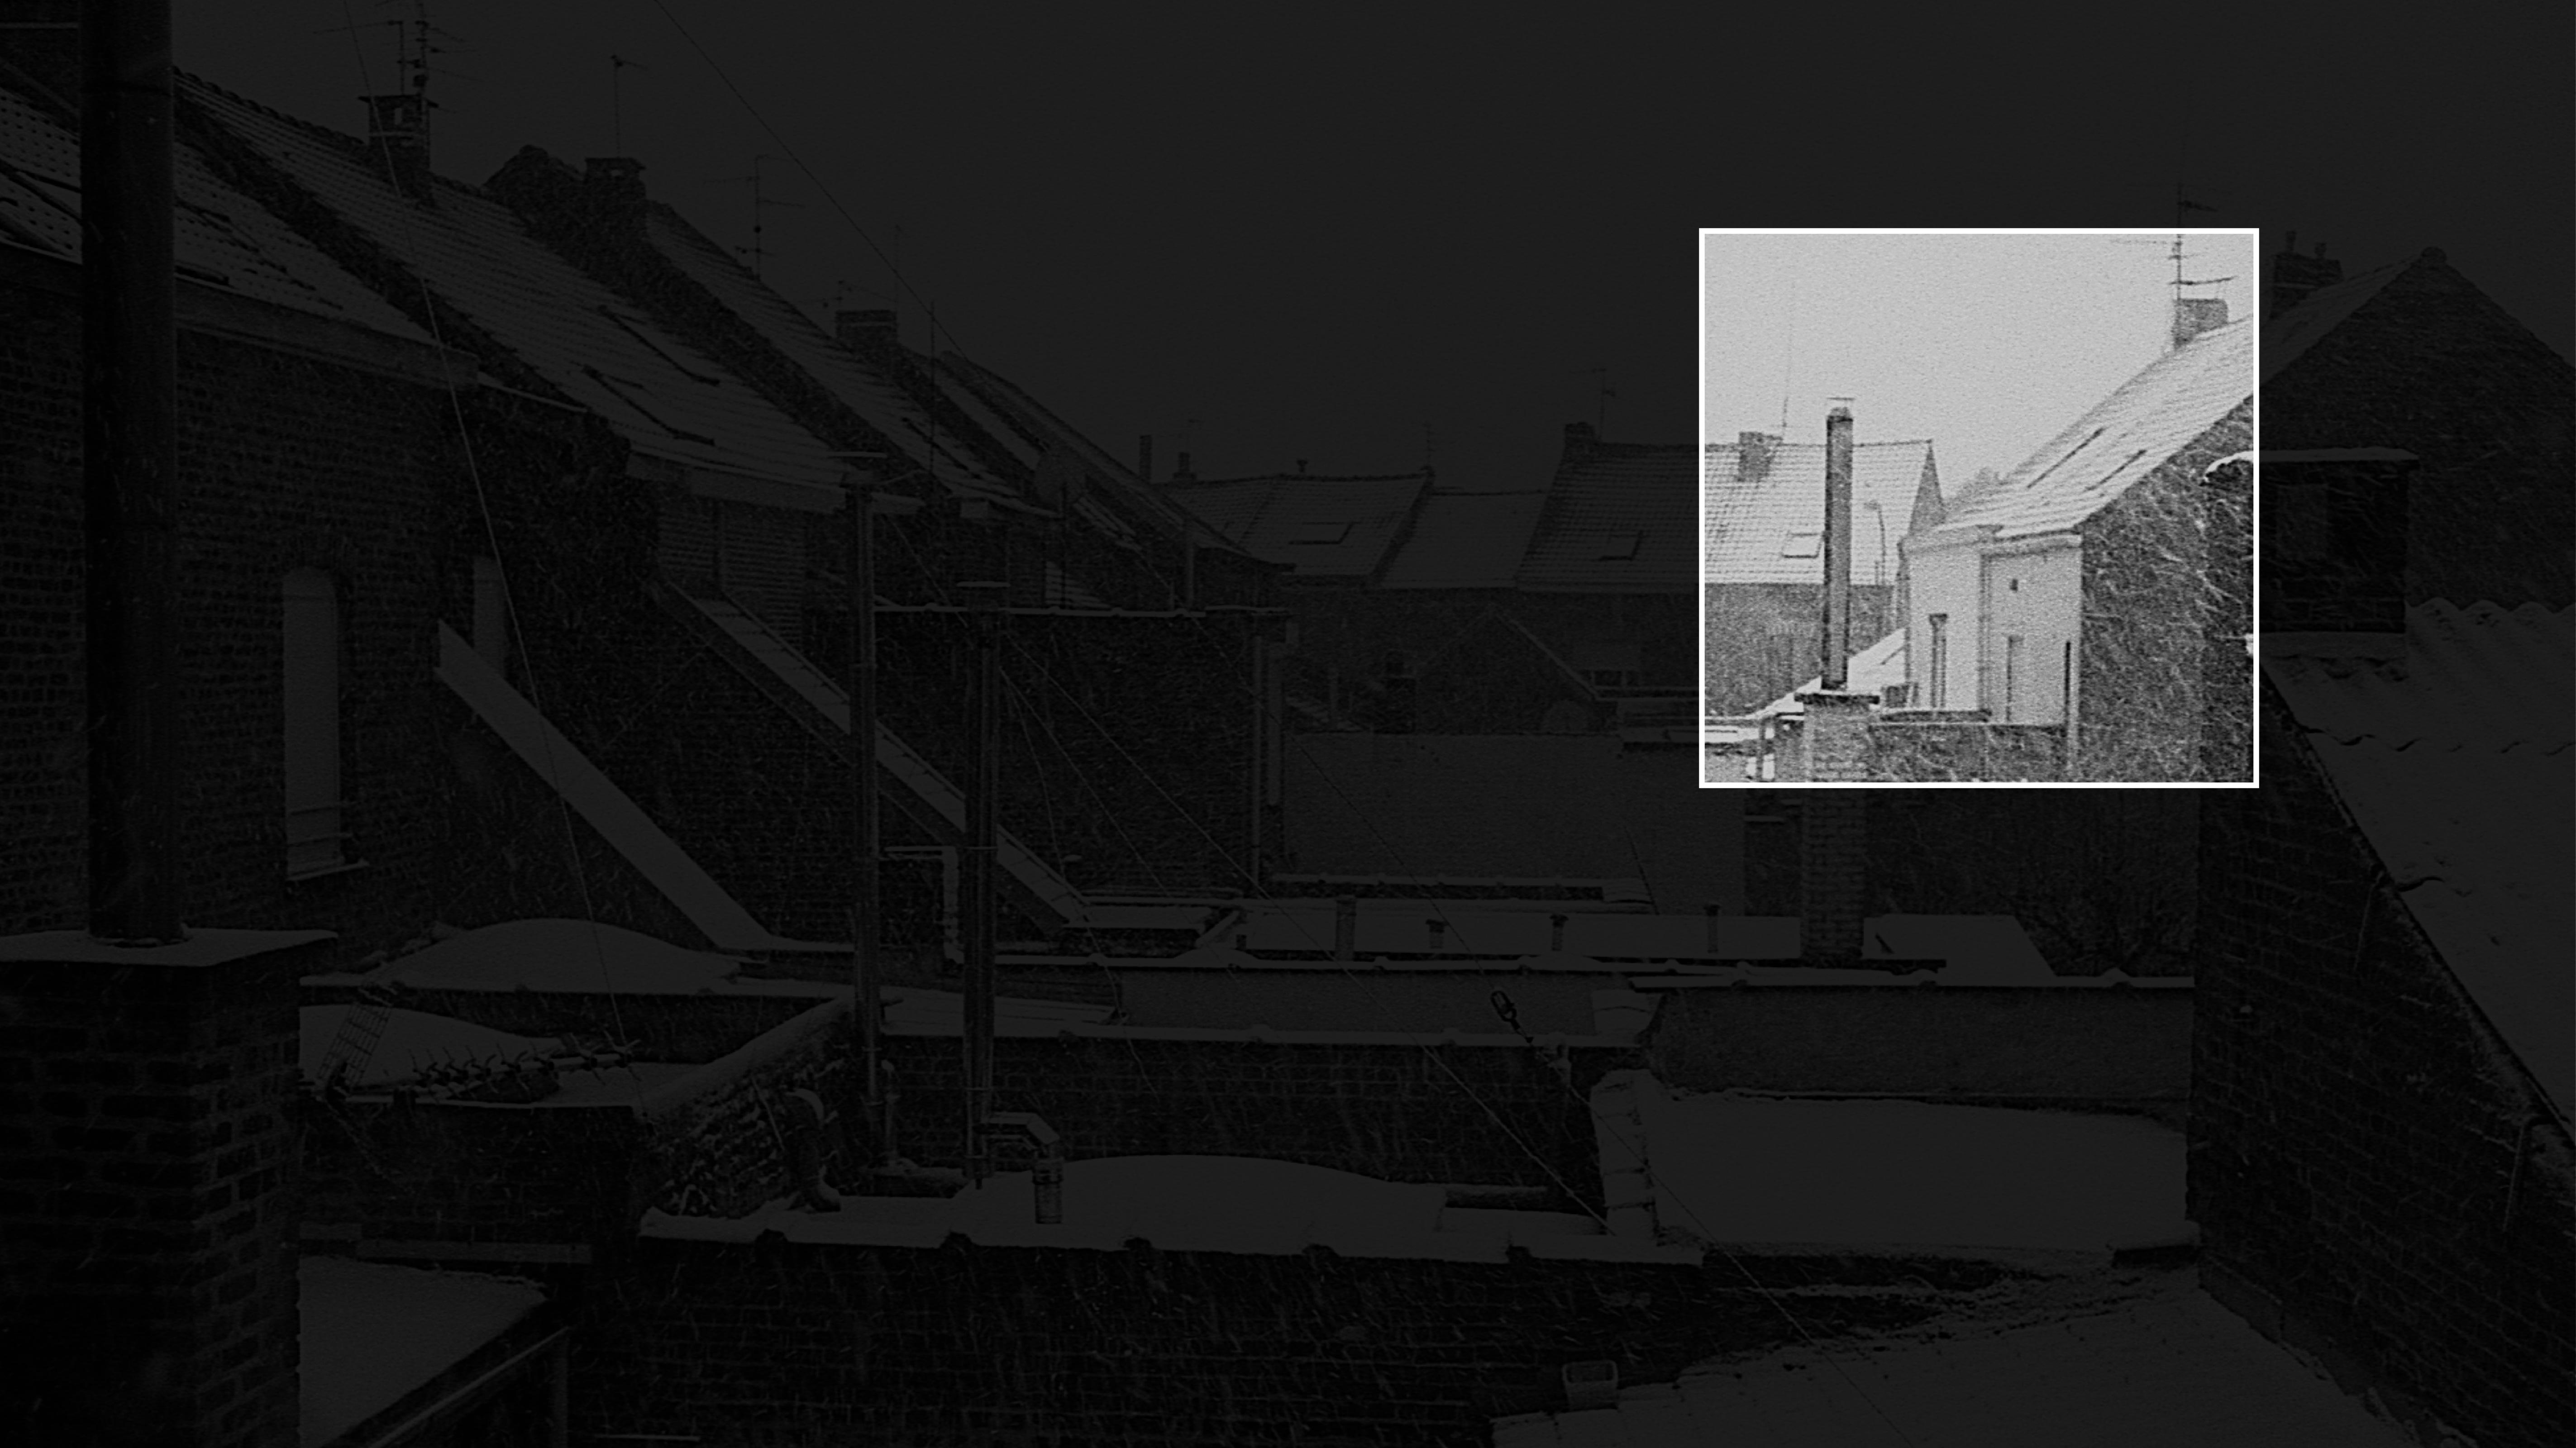 background2-02-02-02.jpg